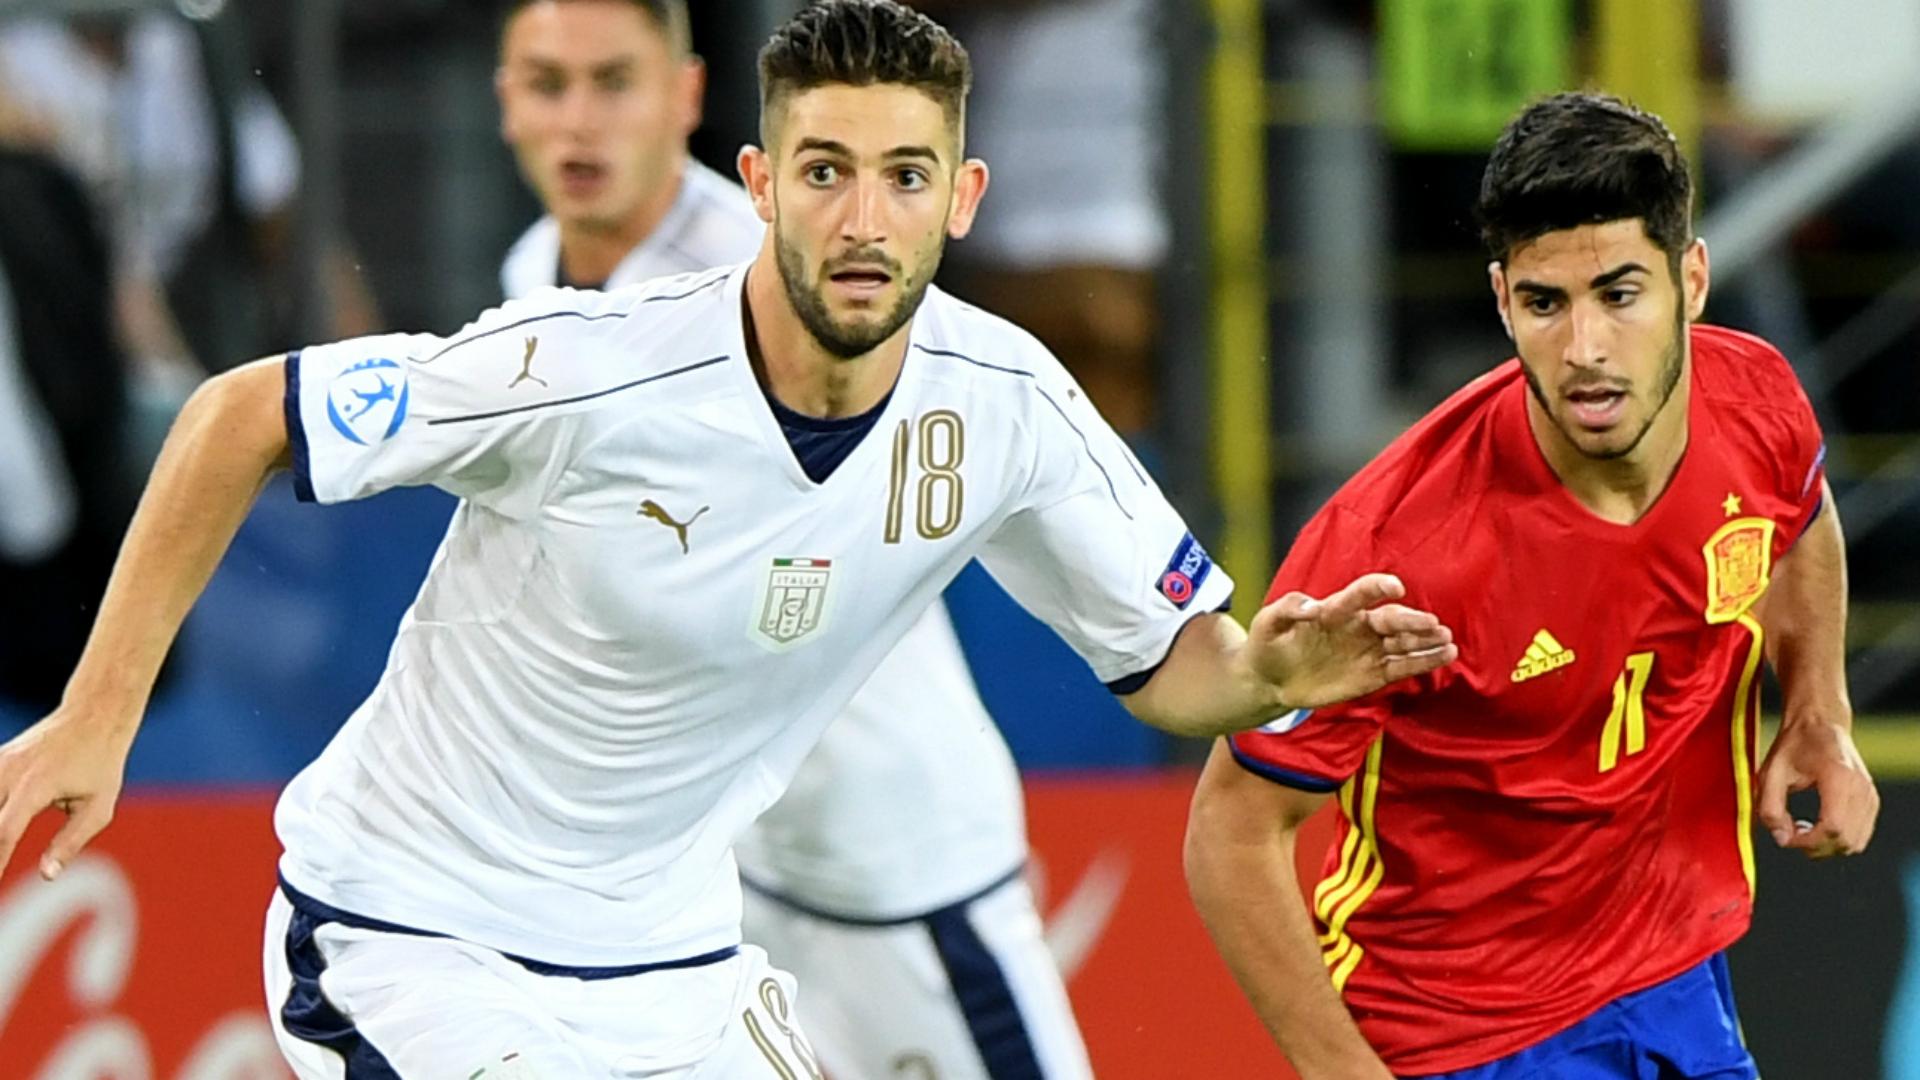 Asensio Gagliardini Spain U21 Italy U21